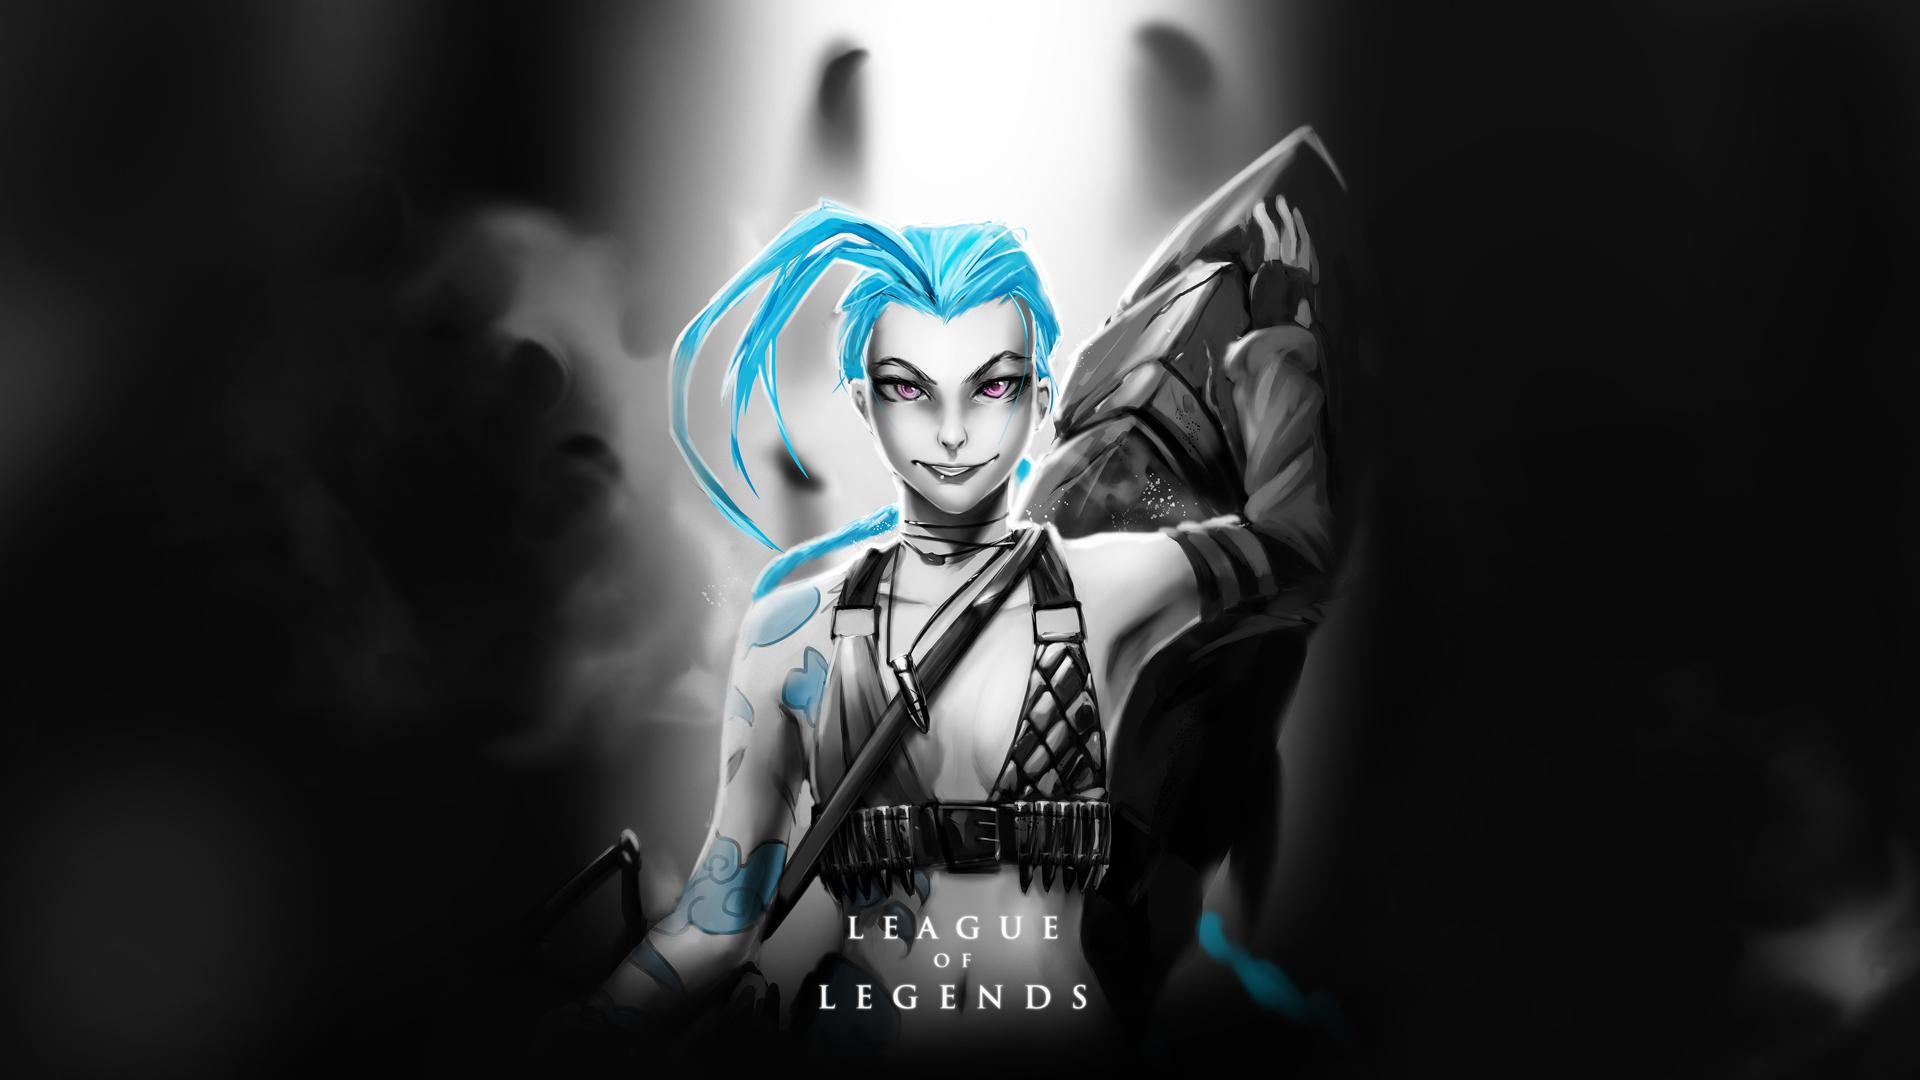 jinx girl art champion league of legends lol game hd 1920x1080 1080p 1920x1080